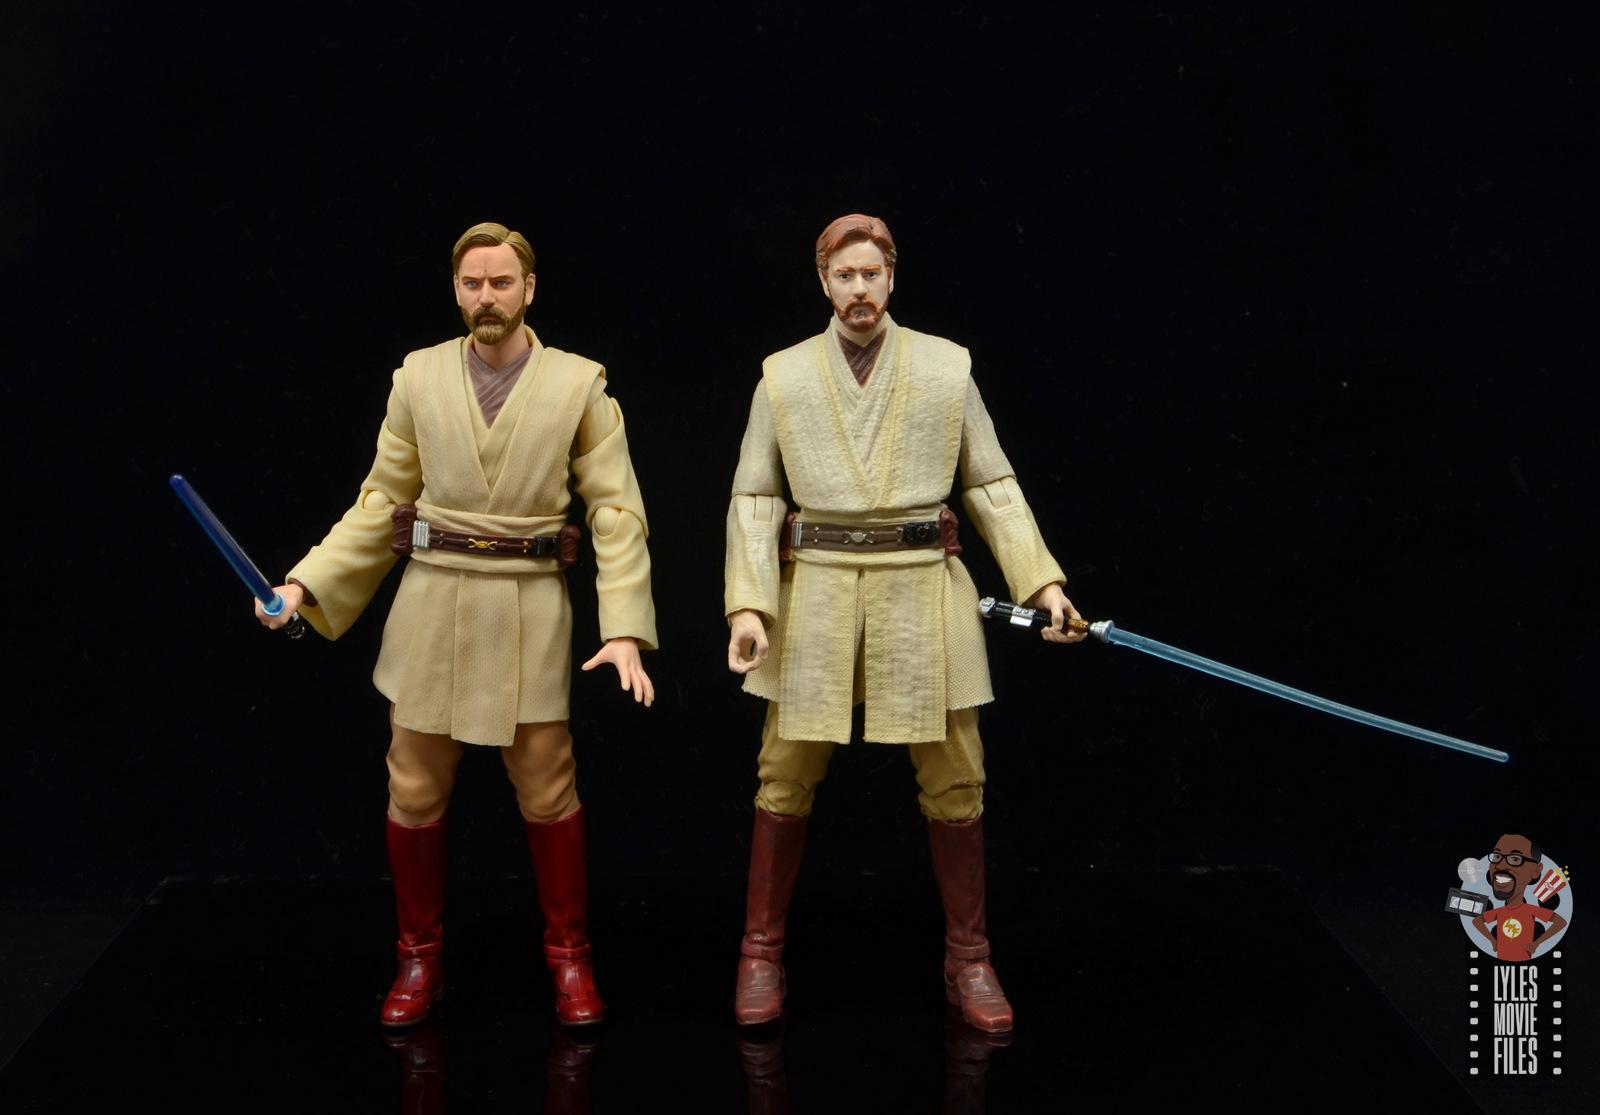 Sh Figuarts Obi Wan Kenobi Revenge Of The Sith Figure Review With Star Wars The Black Series Obi Wan Lyles Movie Files